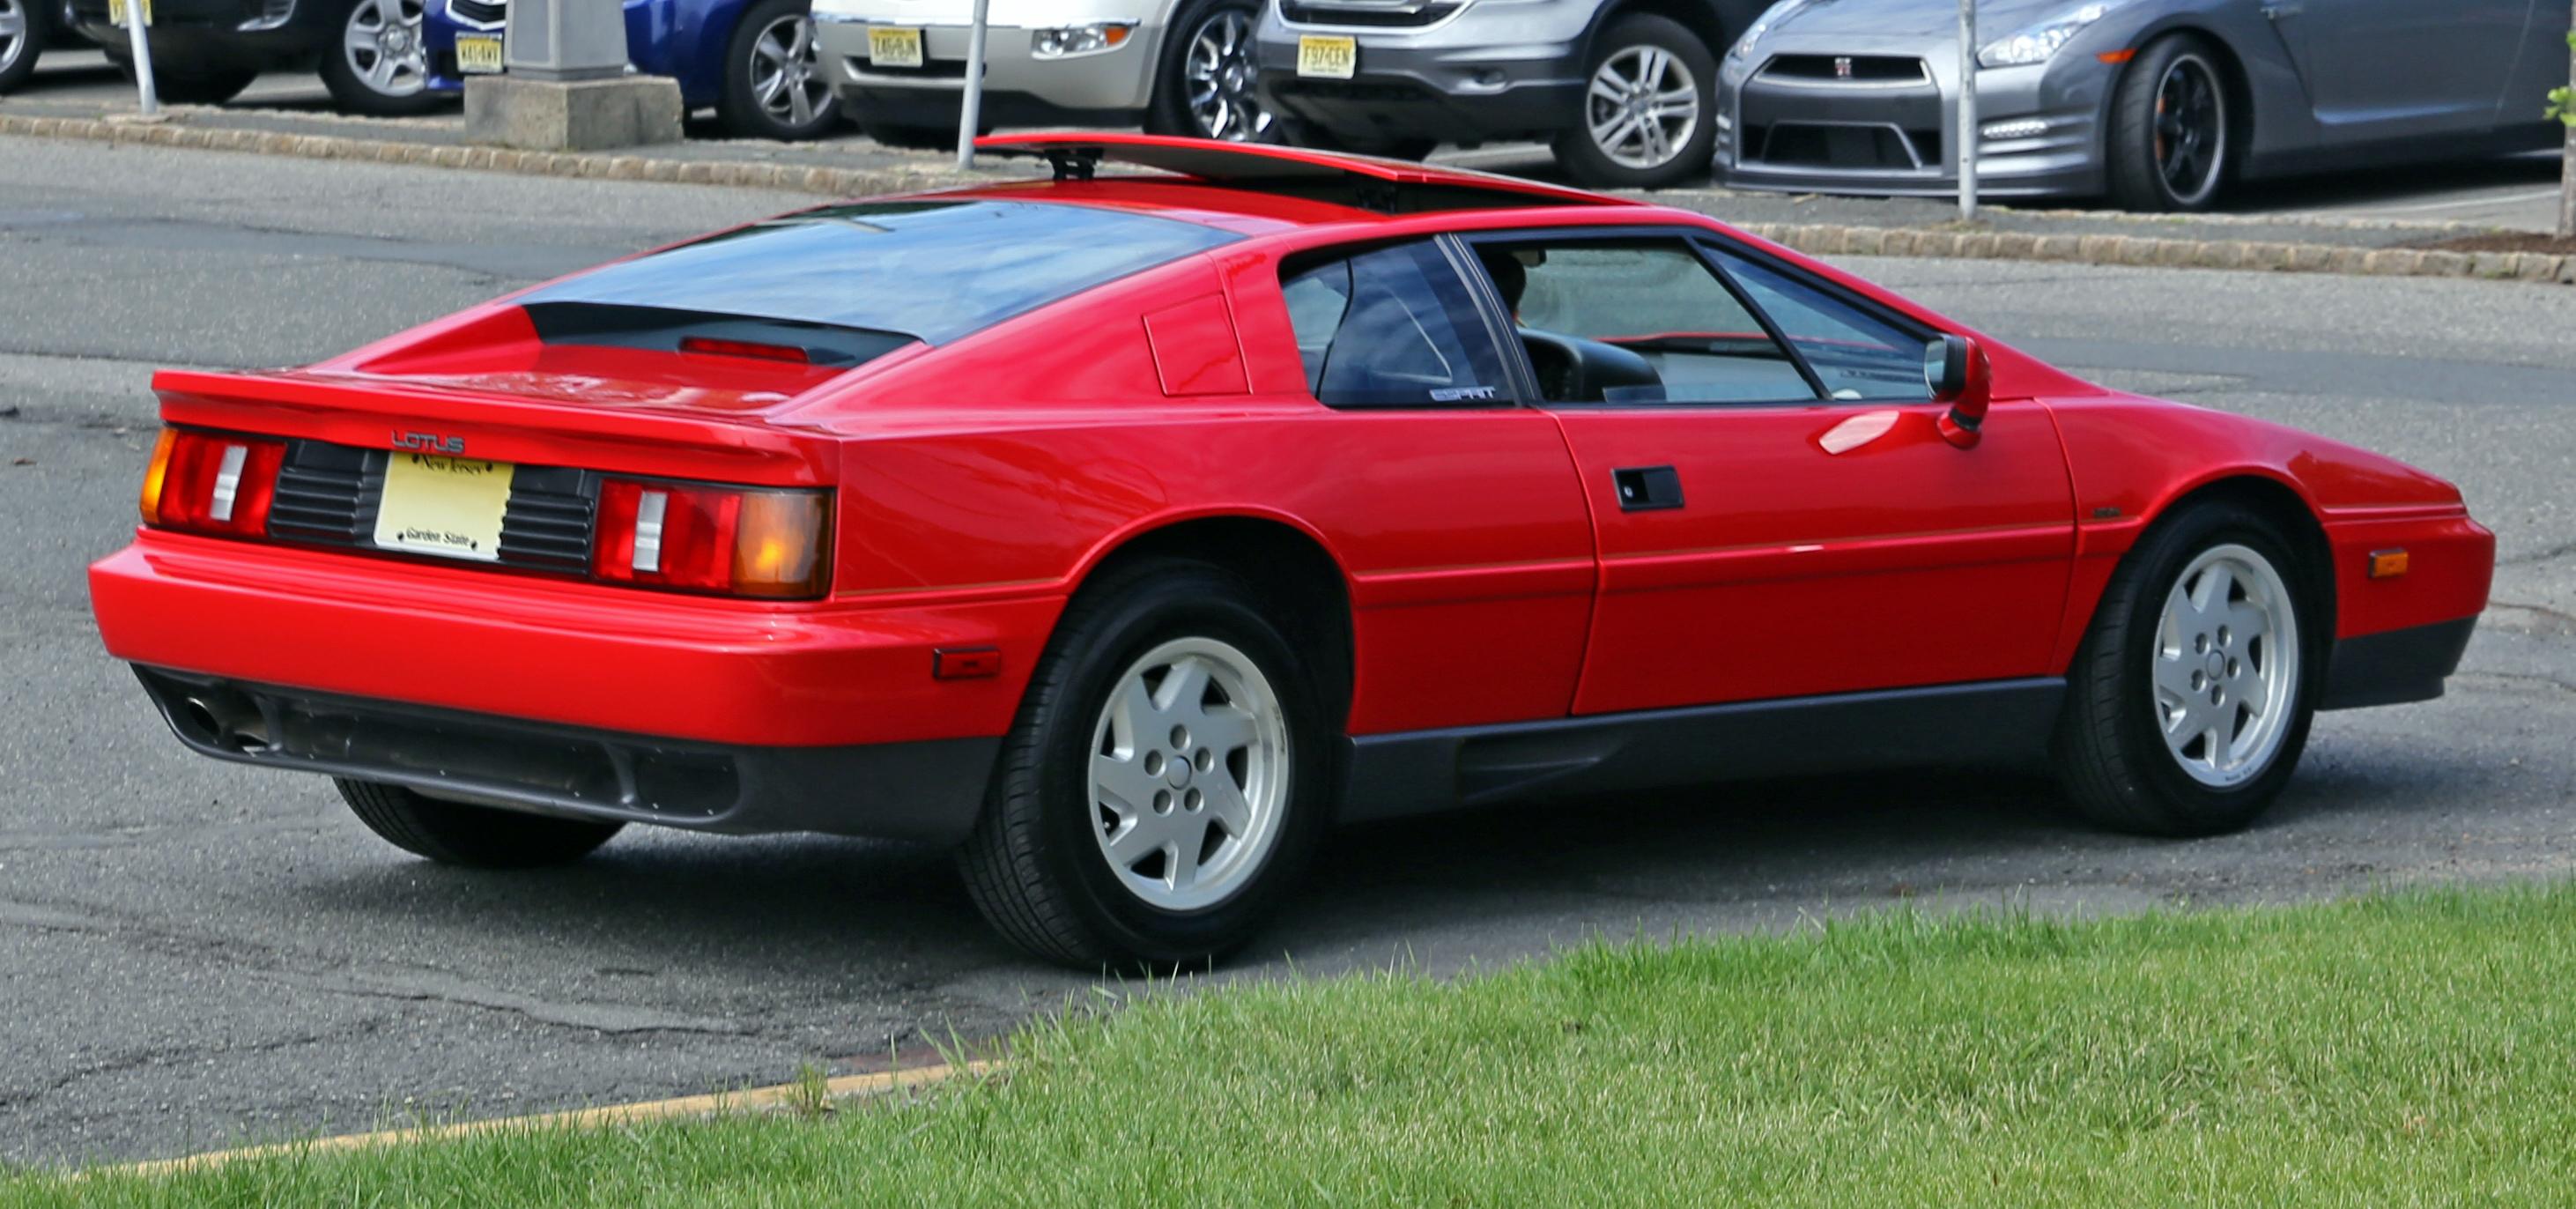 File 1989 Lotus Esprit Turbo Rear Federal Jpg Wikimedia